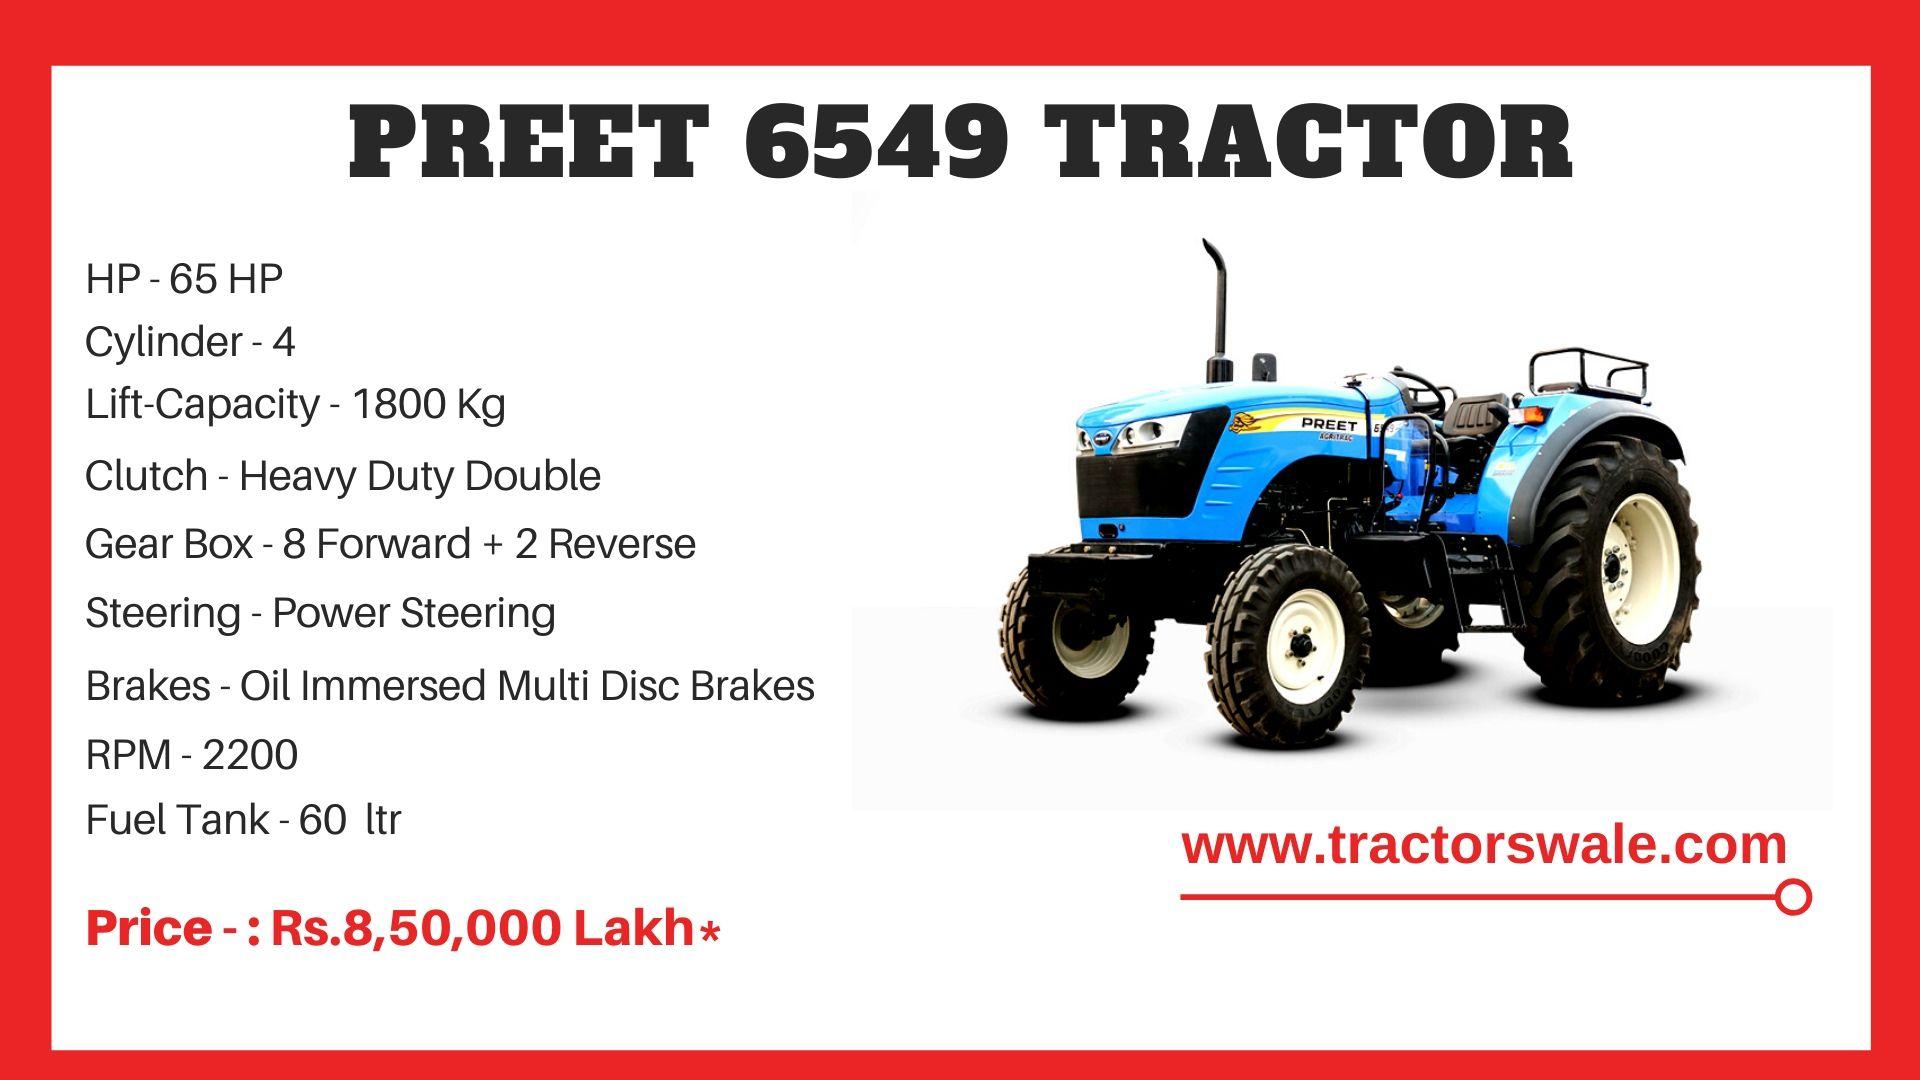 Preet 6549 tractor price